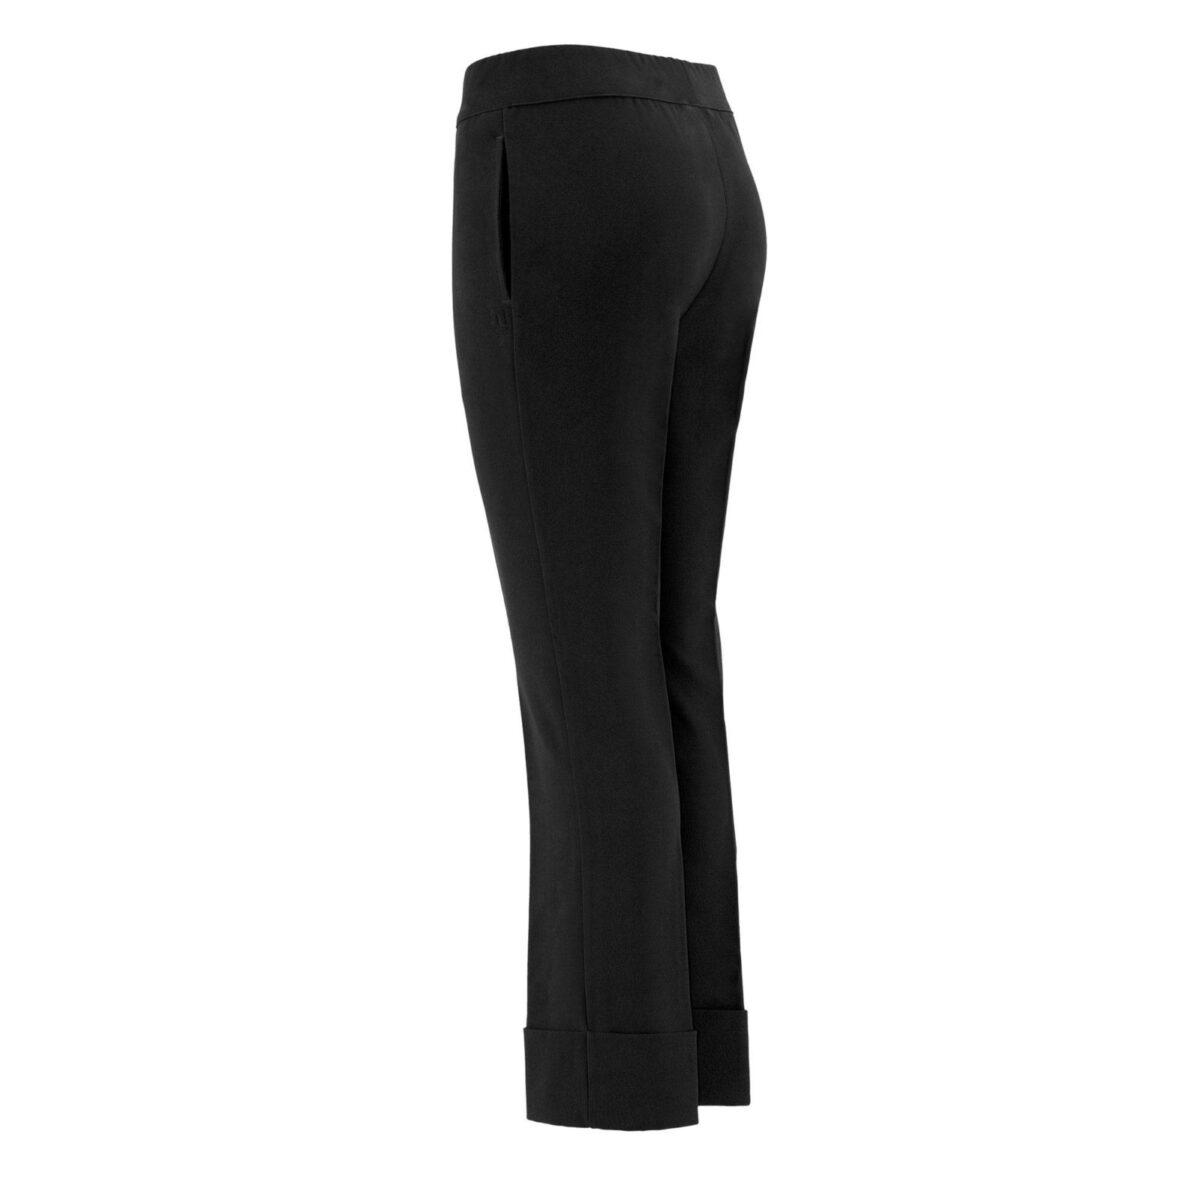 Pantalone Folded hem NERO - vista laterale | Nicla